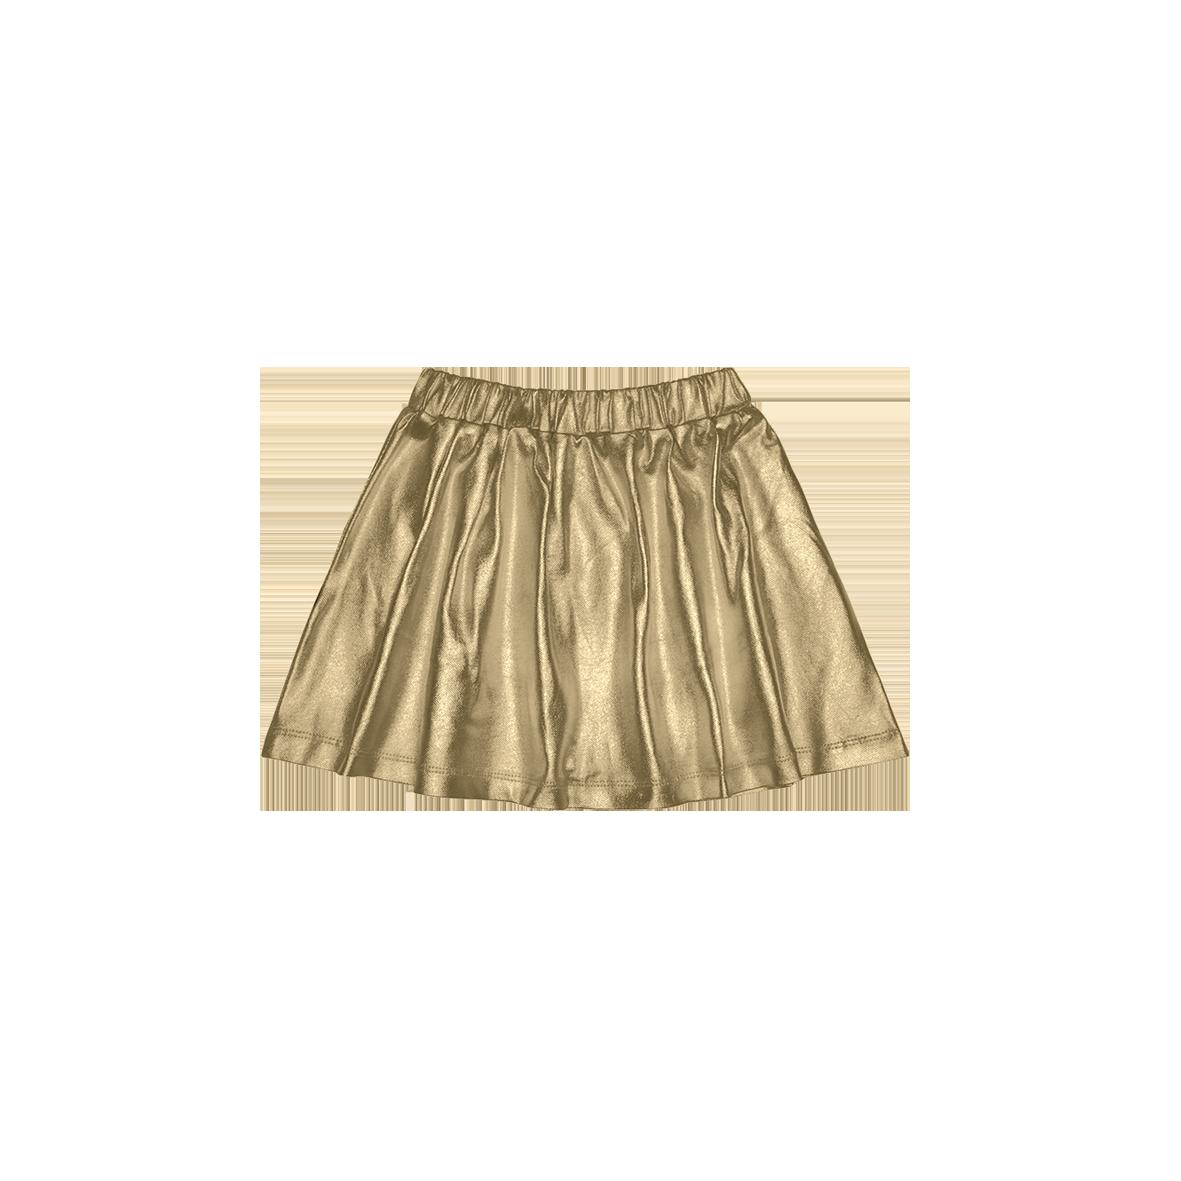 Metallic Skirt Gold